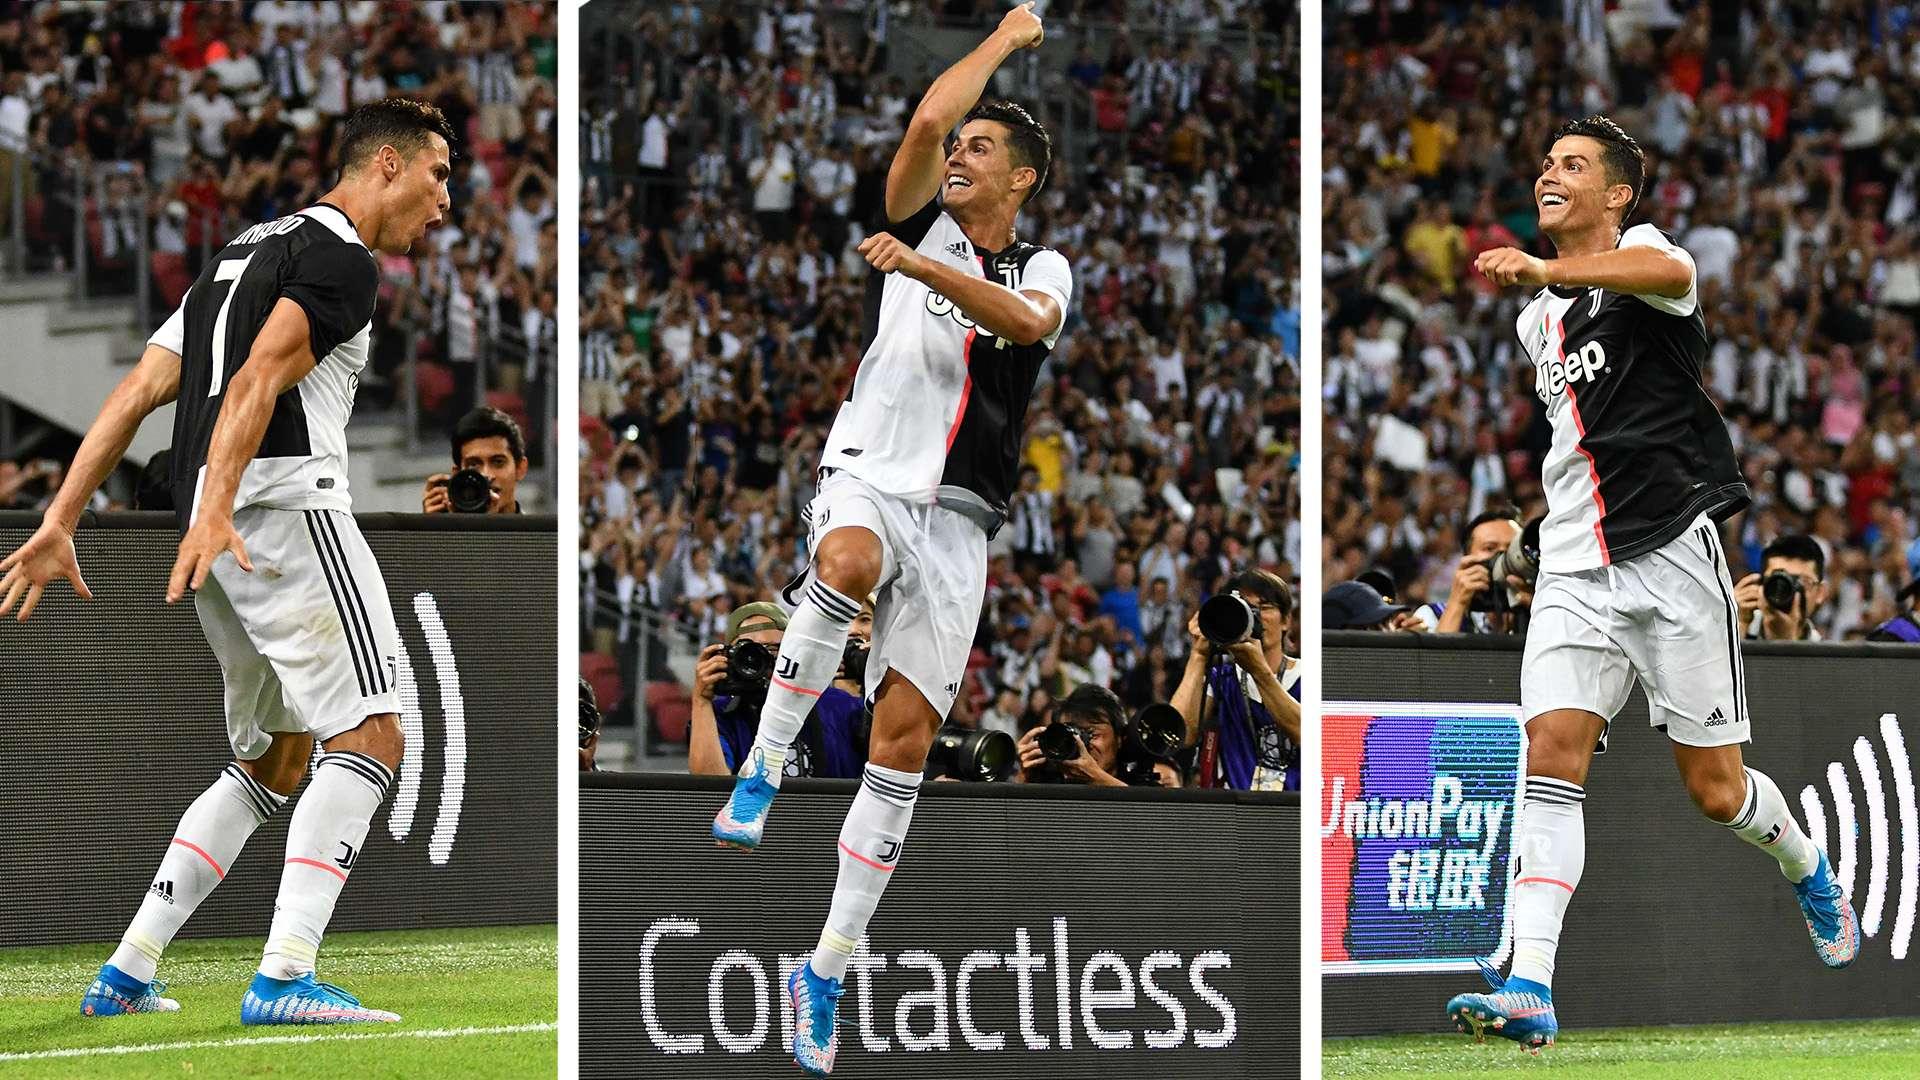 Cristiano Ronaldo 2020 Celebration